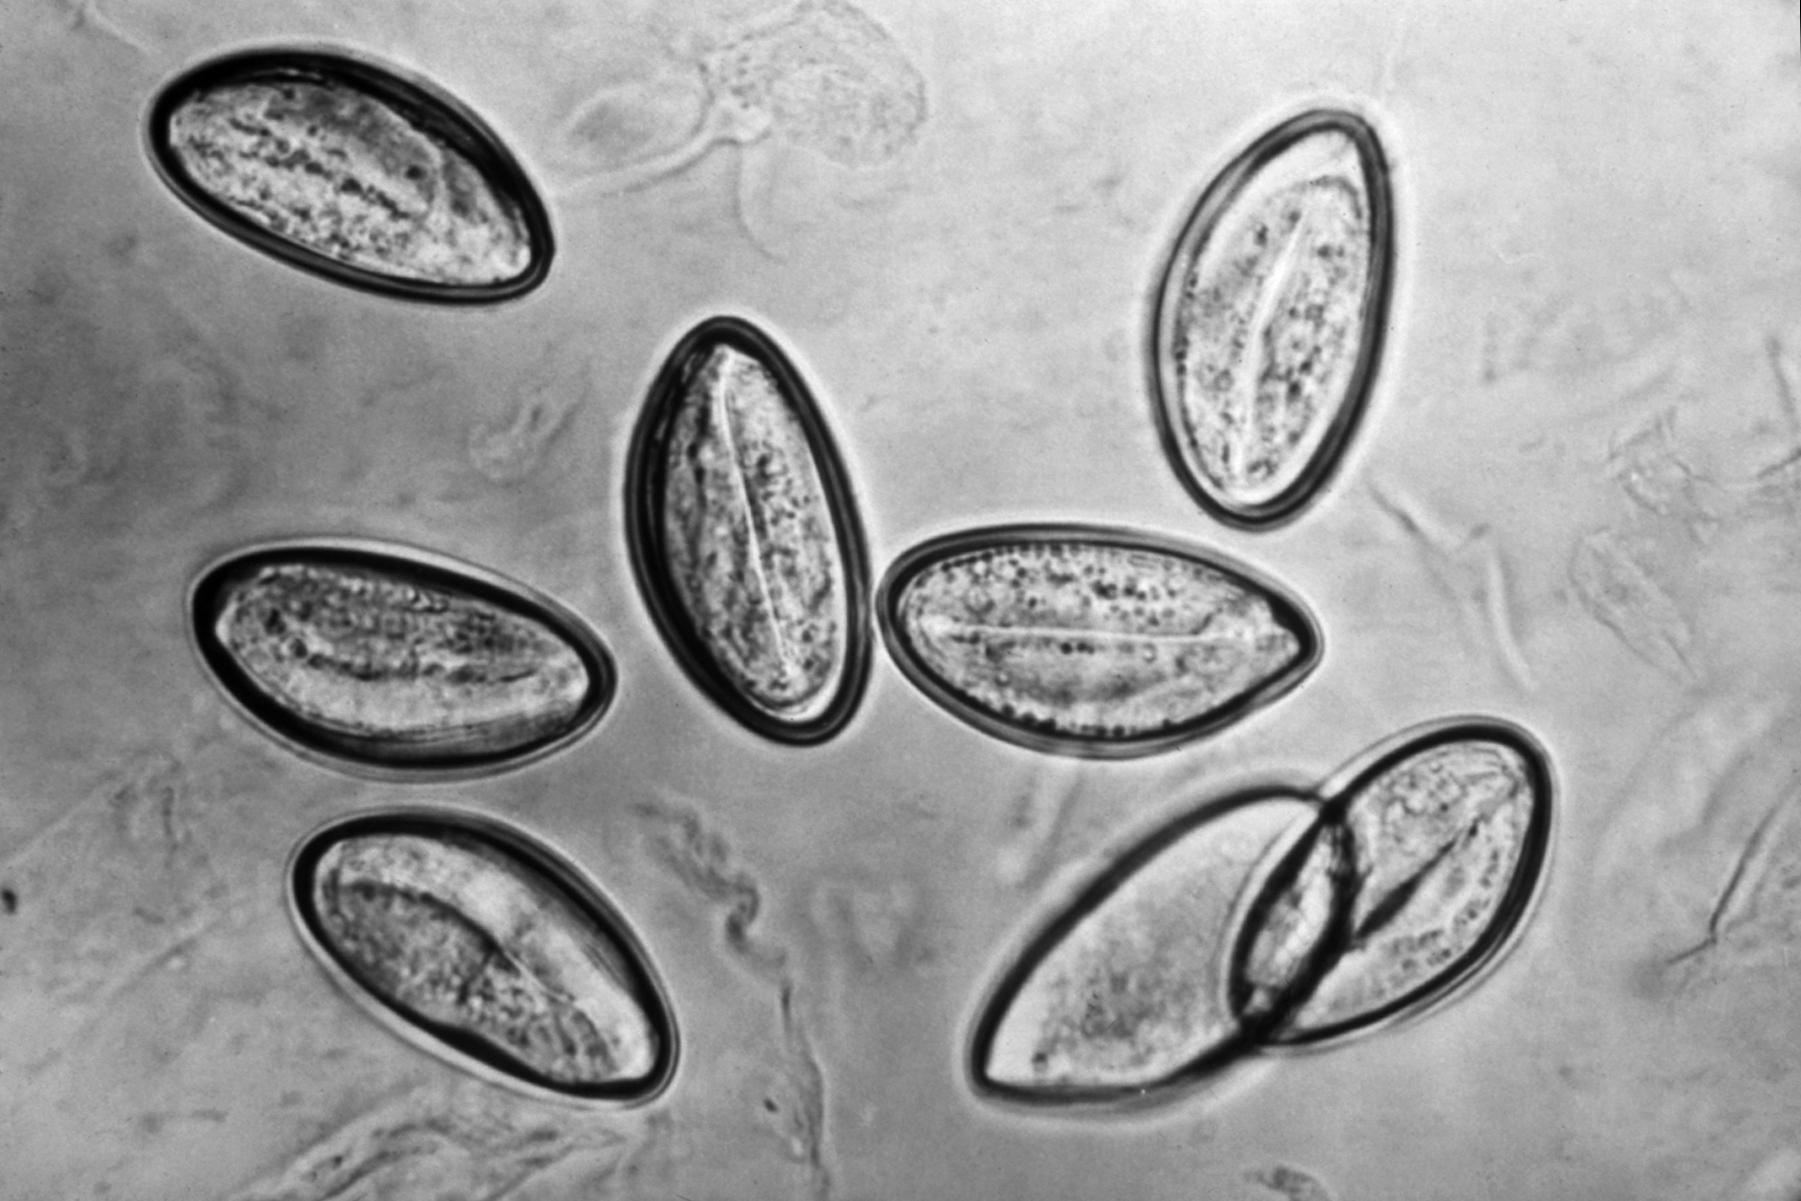 Cn enterobiosis, Enterobiasis gyermekek